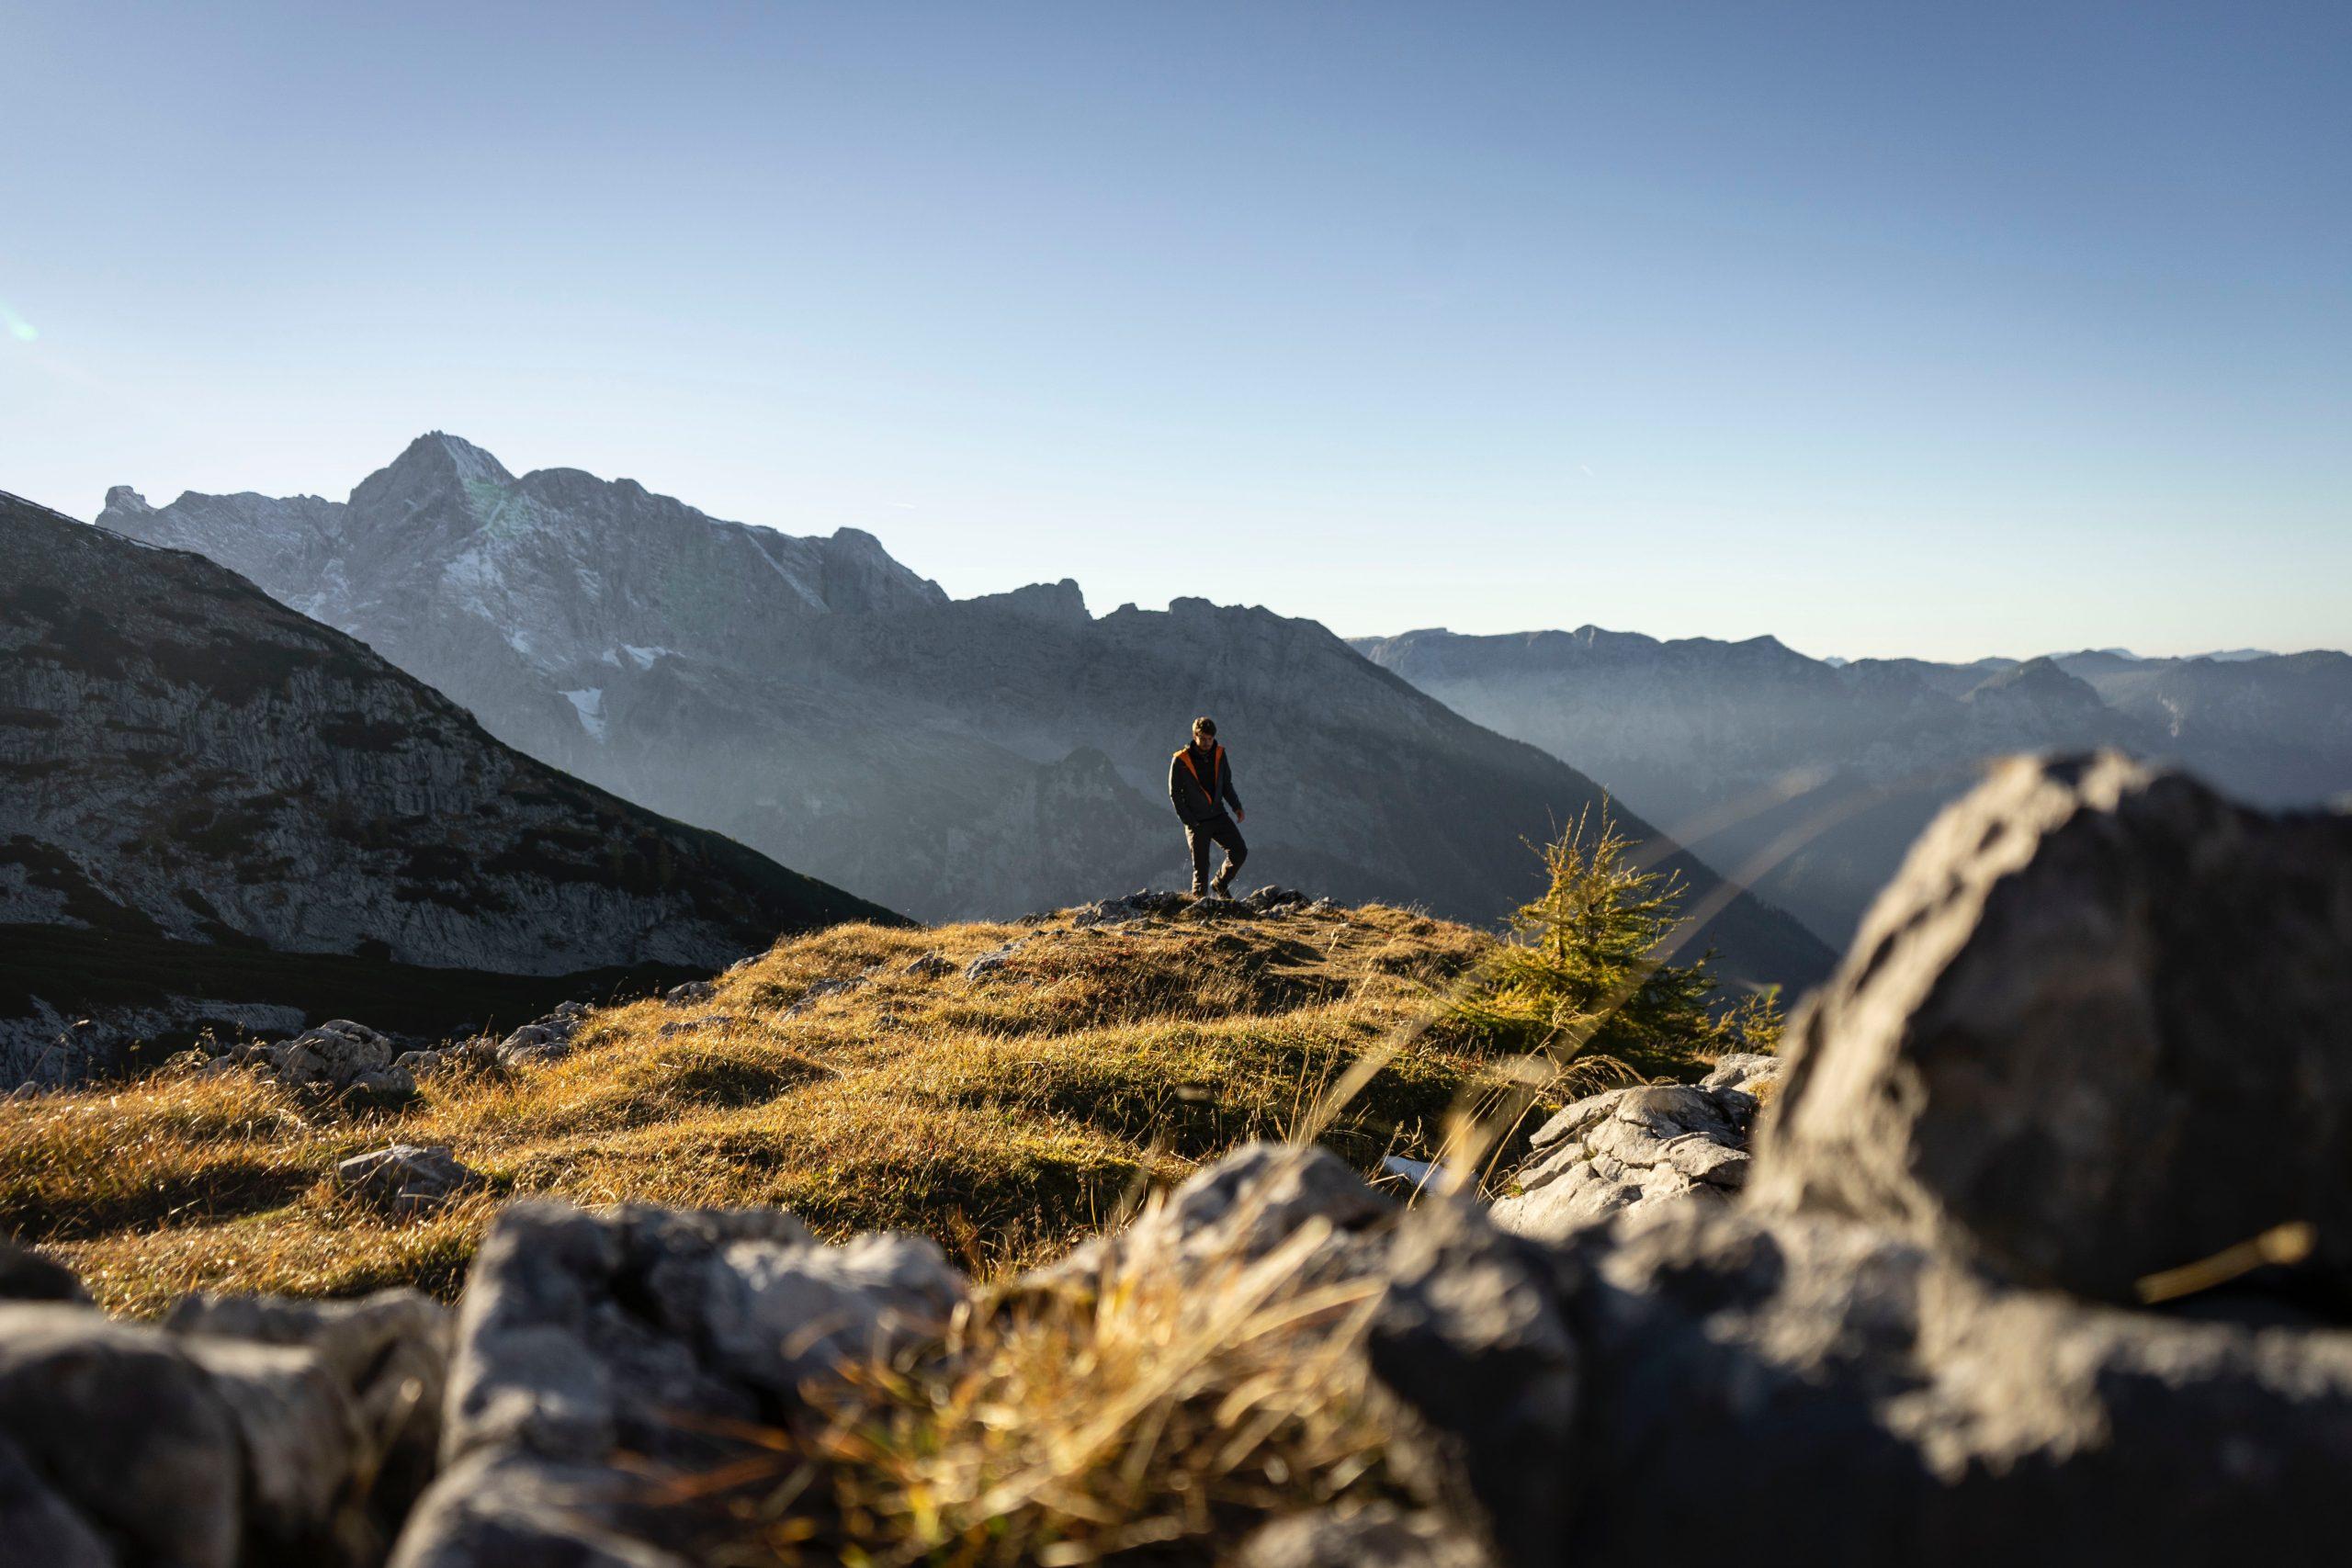 Bildmotiv: Bergbild mit Bergsteiger